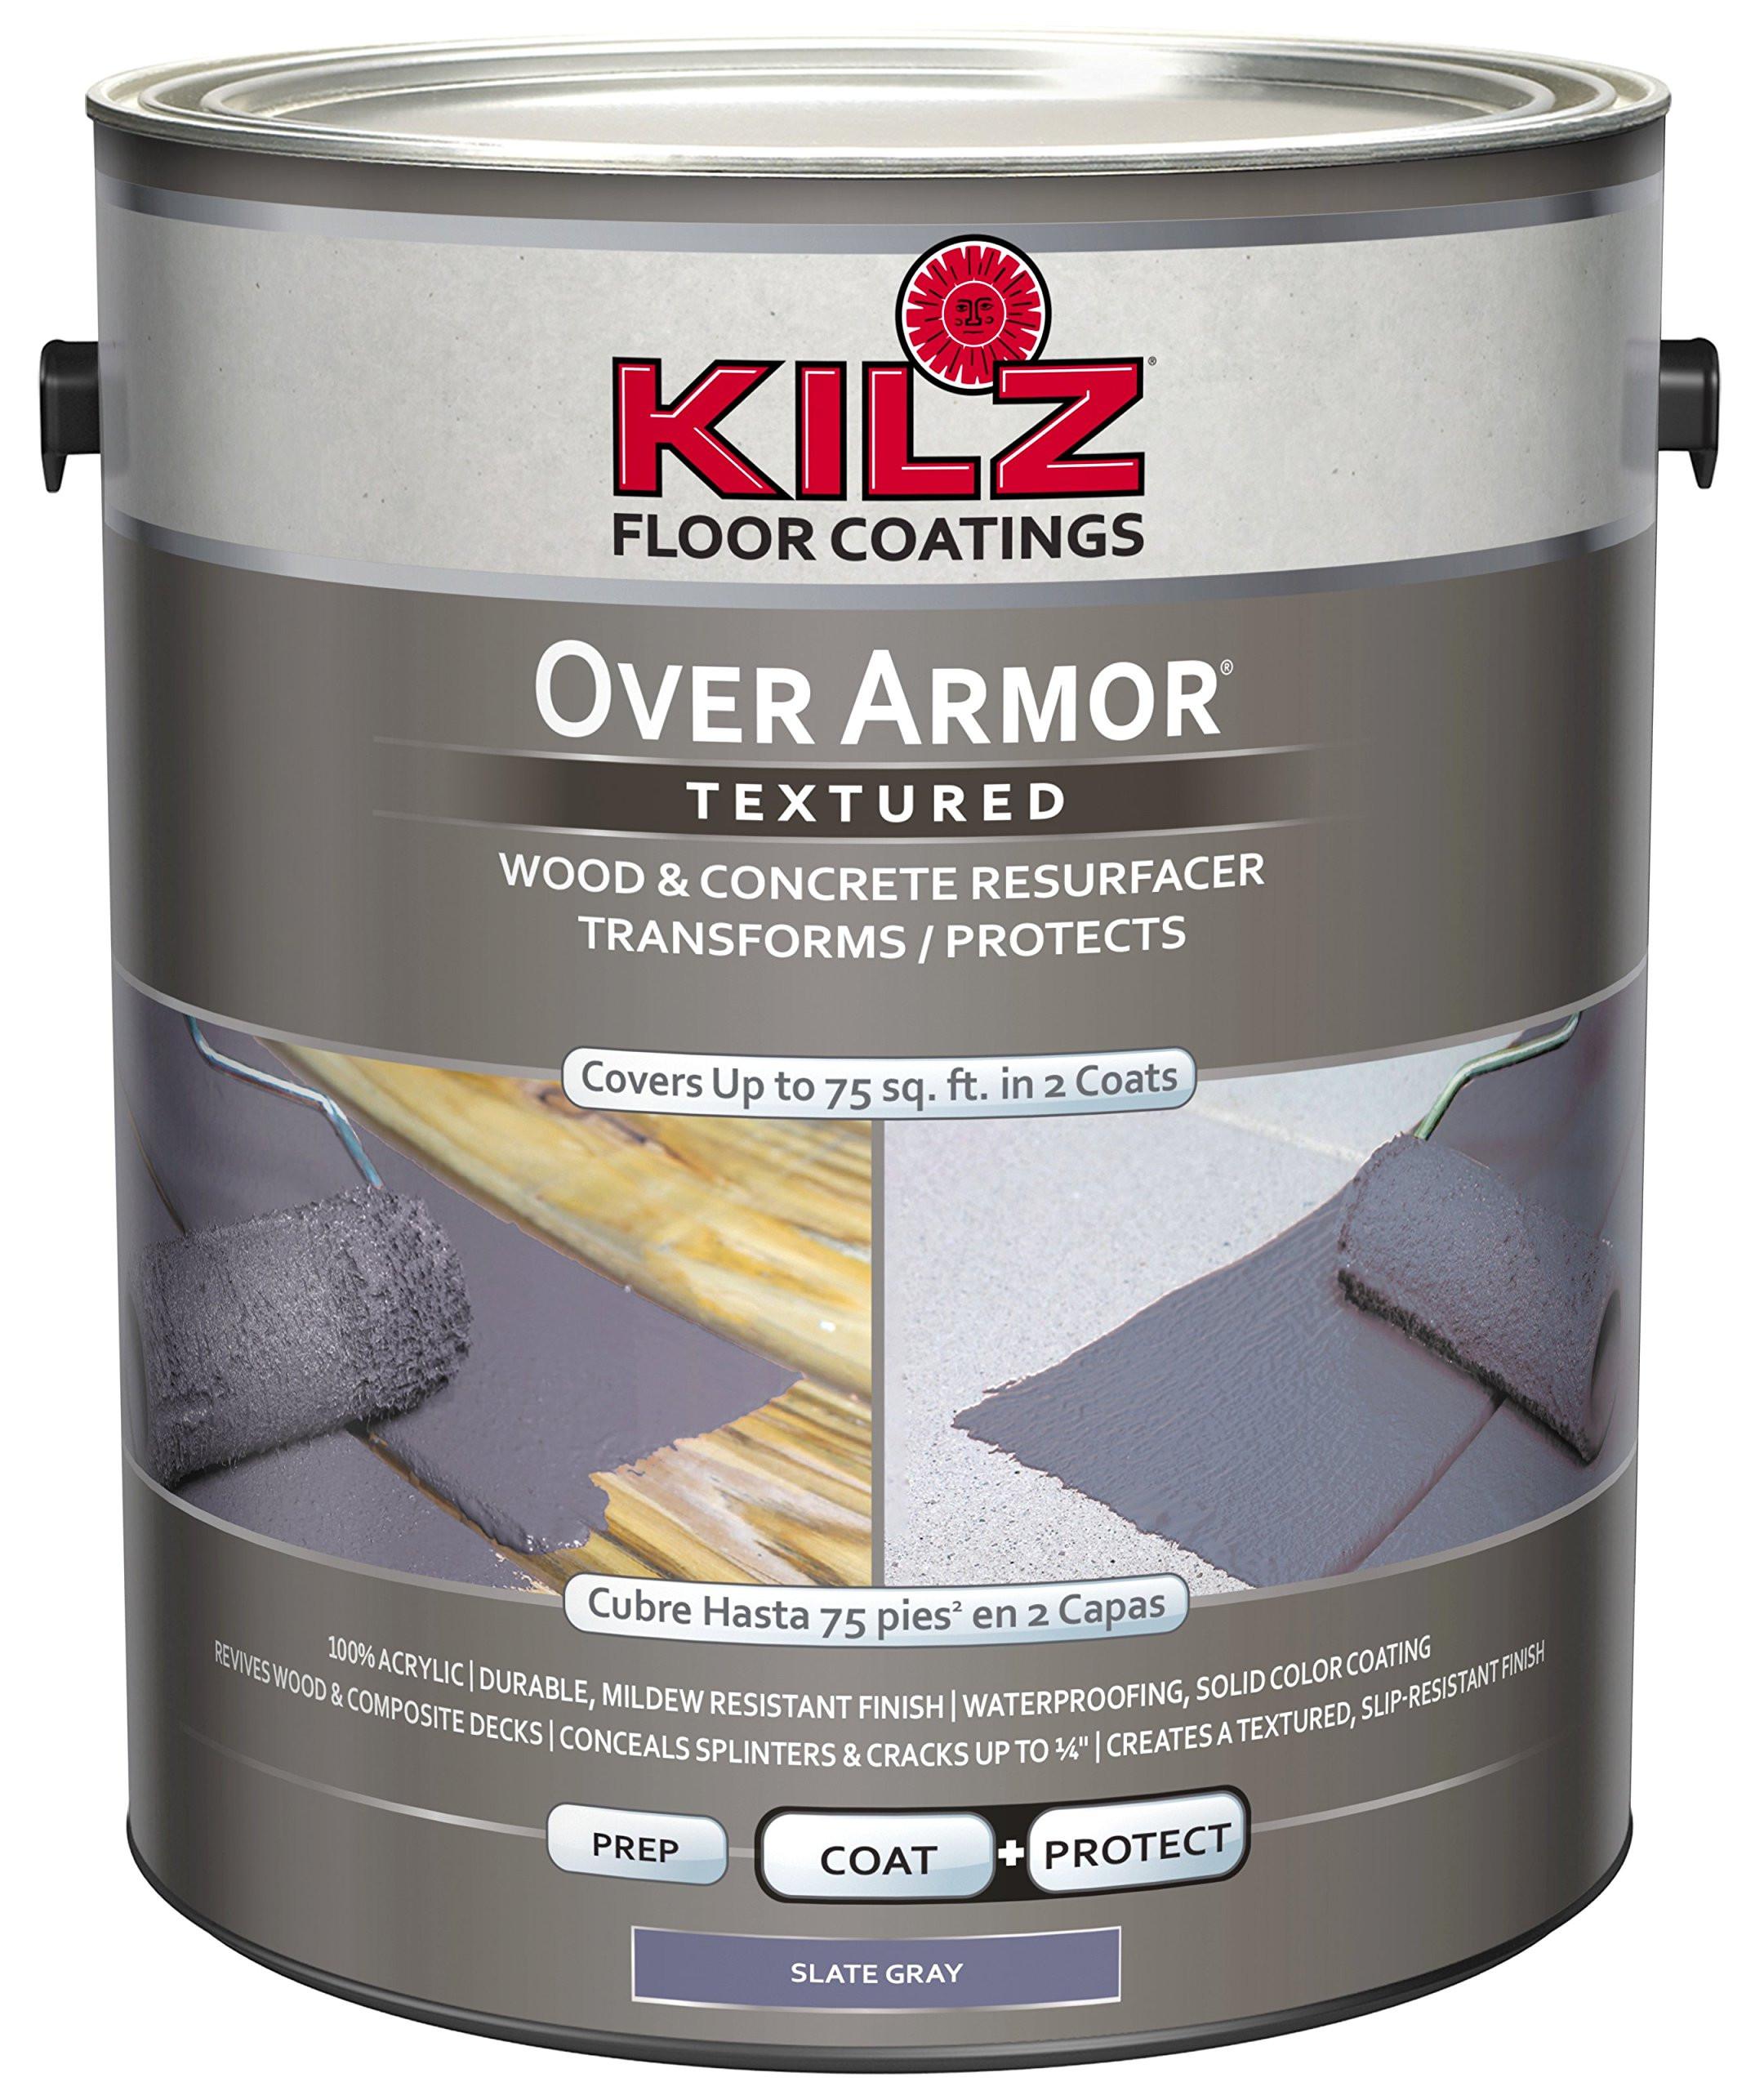 how to put hardwood floor on concrete of kilz over armor textured wood concrete coating 1 gallon slate gray throughout kilz over armor textured wood concrete coating 1 gallon slate gray